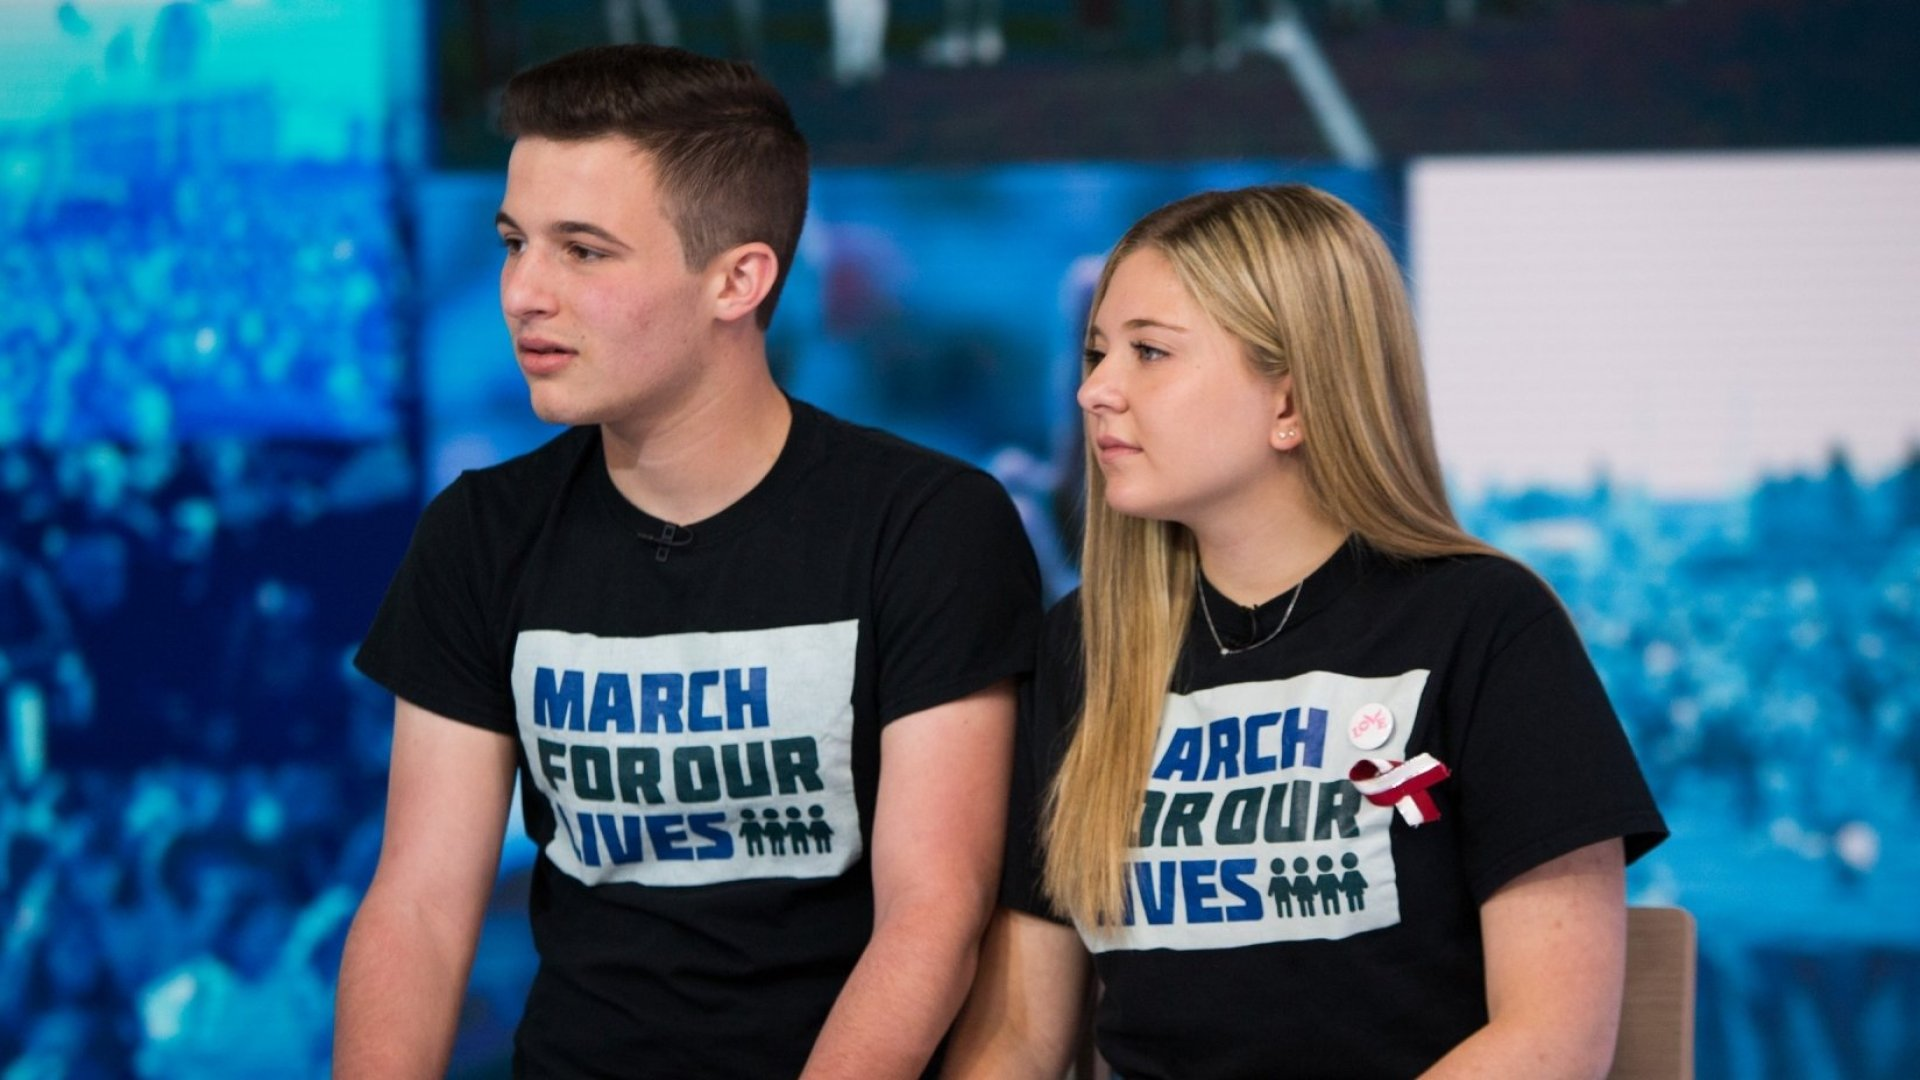 Marjory Stoneman Douglas students Cameron Kasky (left) and Jaclyn Corin from Parkland, Florida.